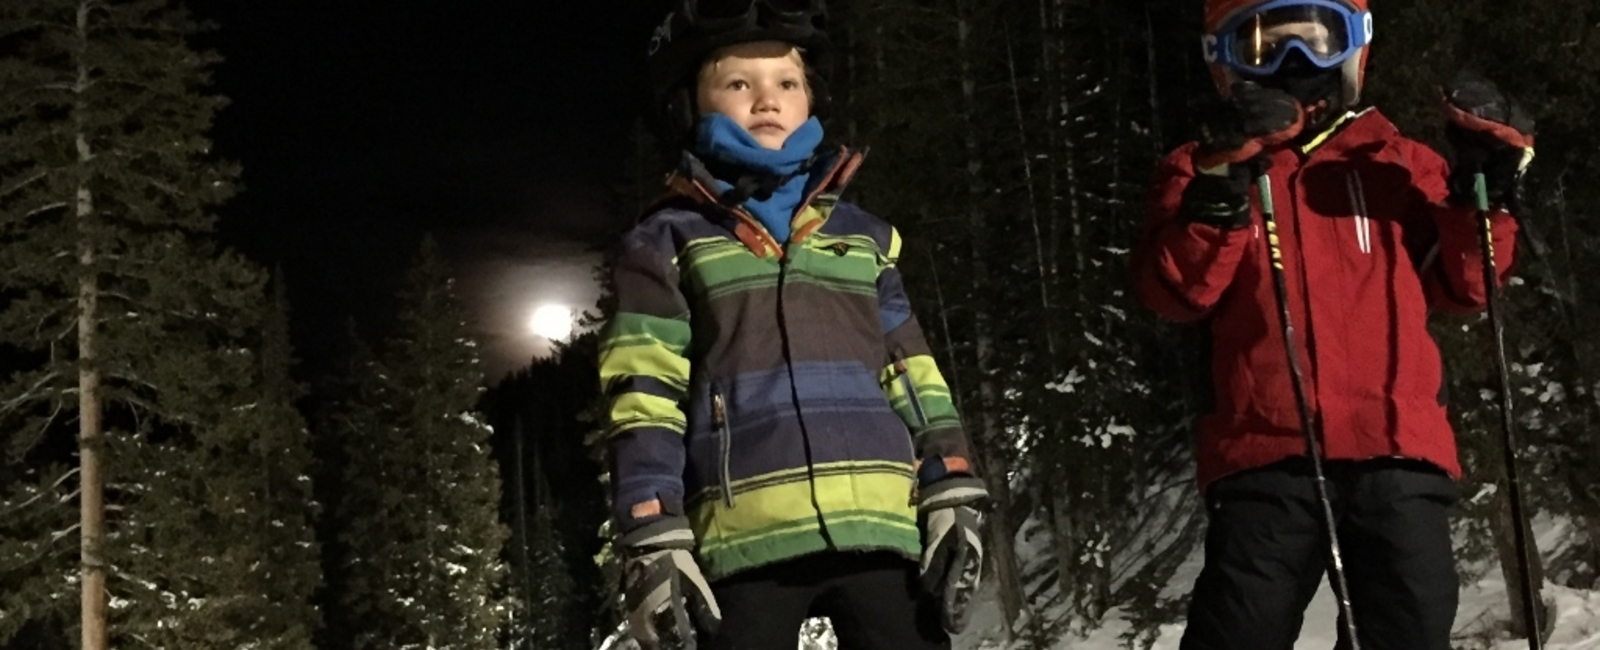 Night skiing....enjoy the silence!